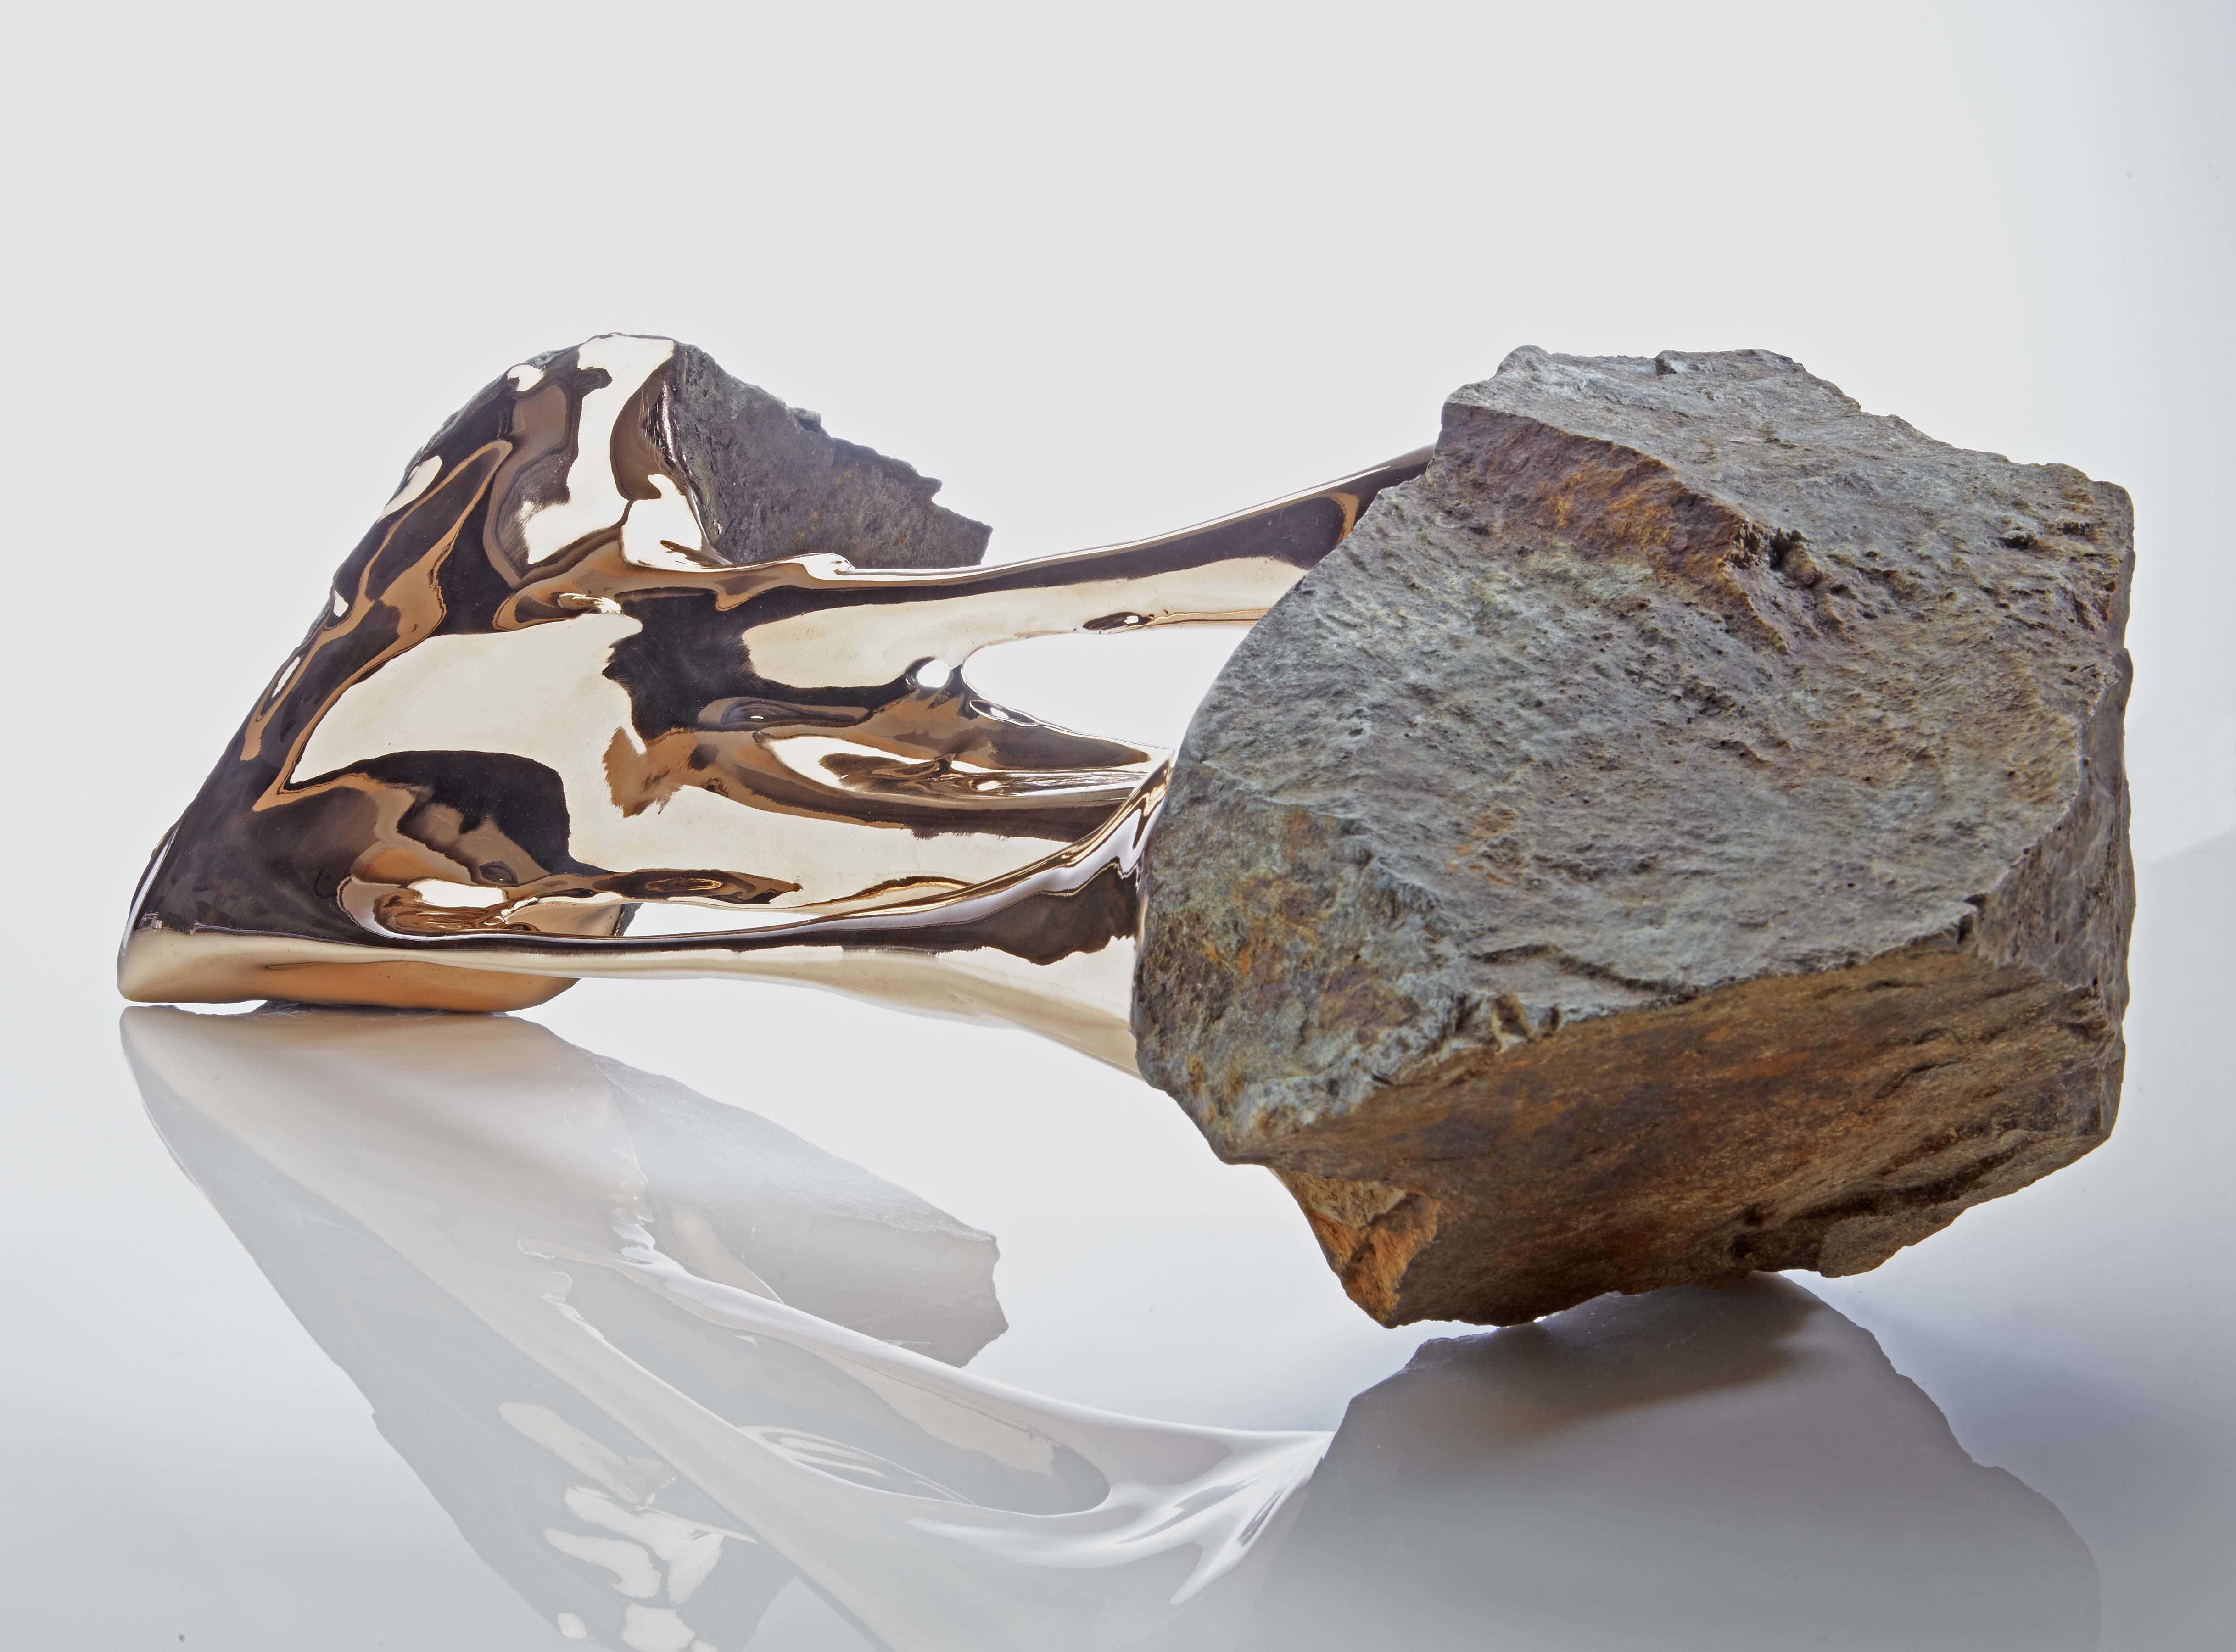 Materia prima, bronze